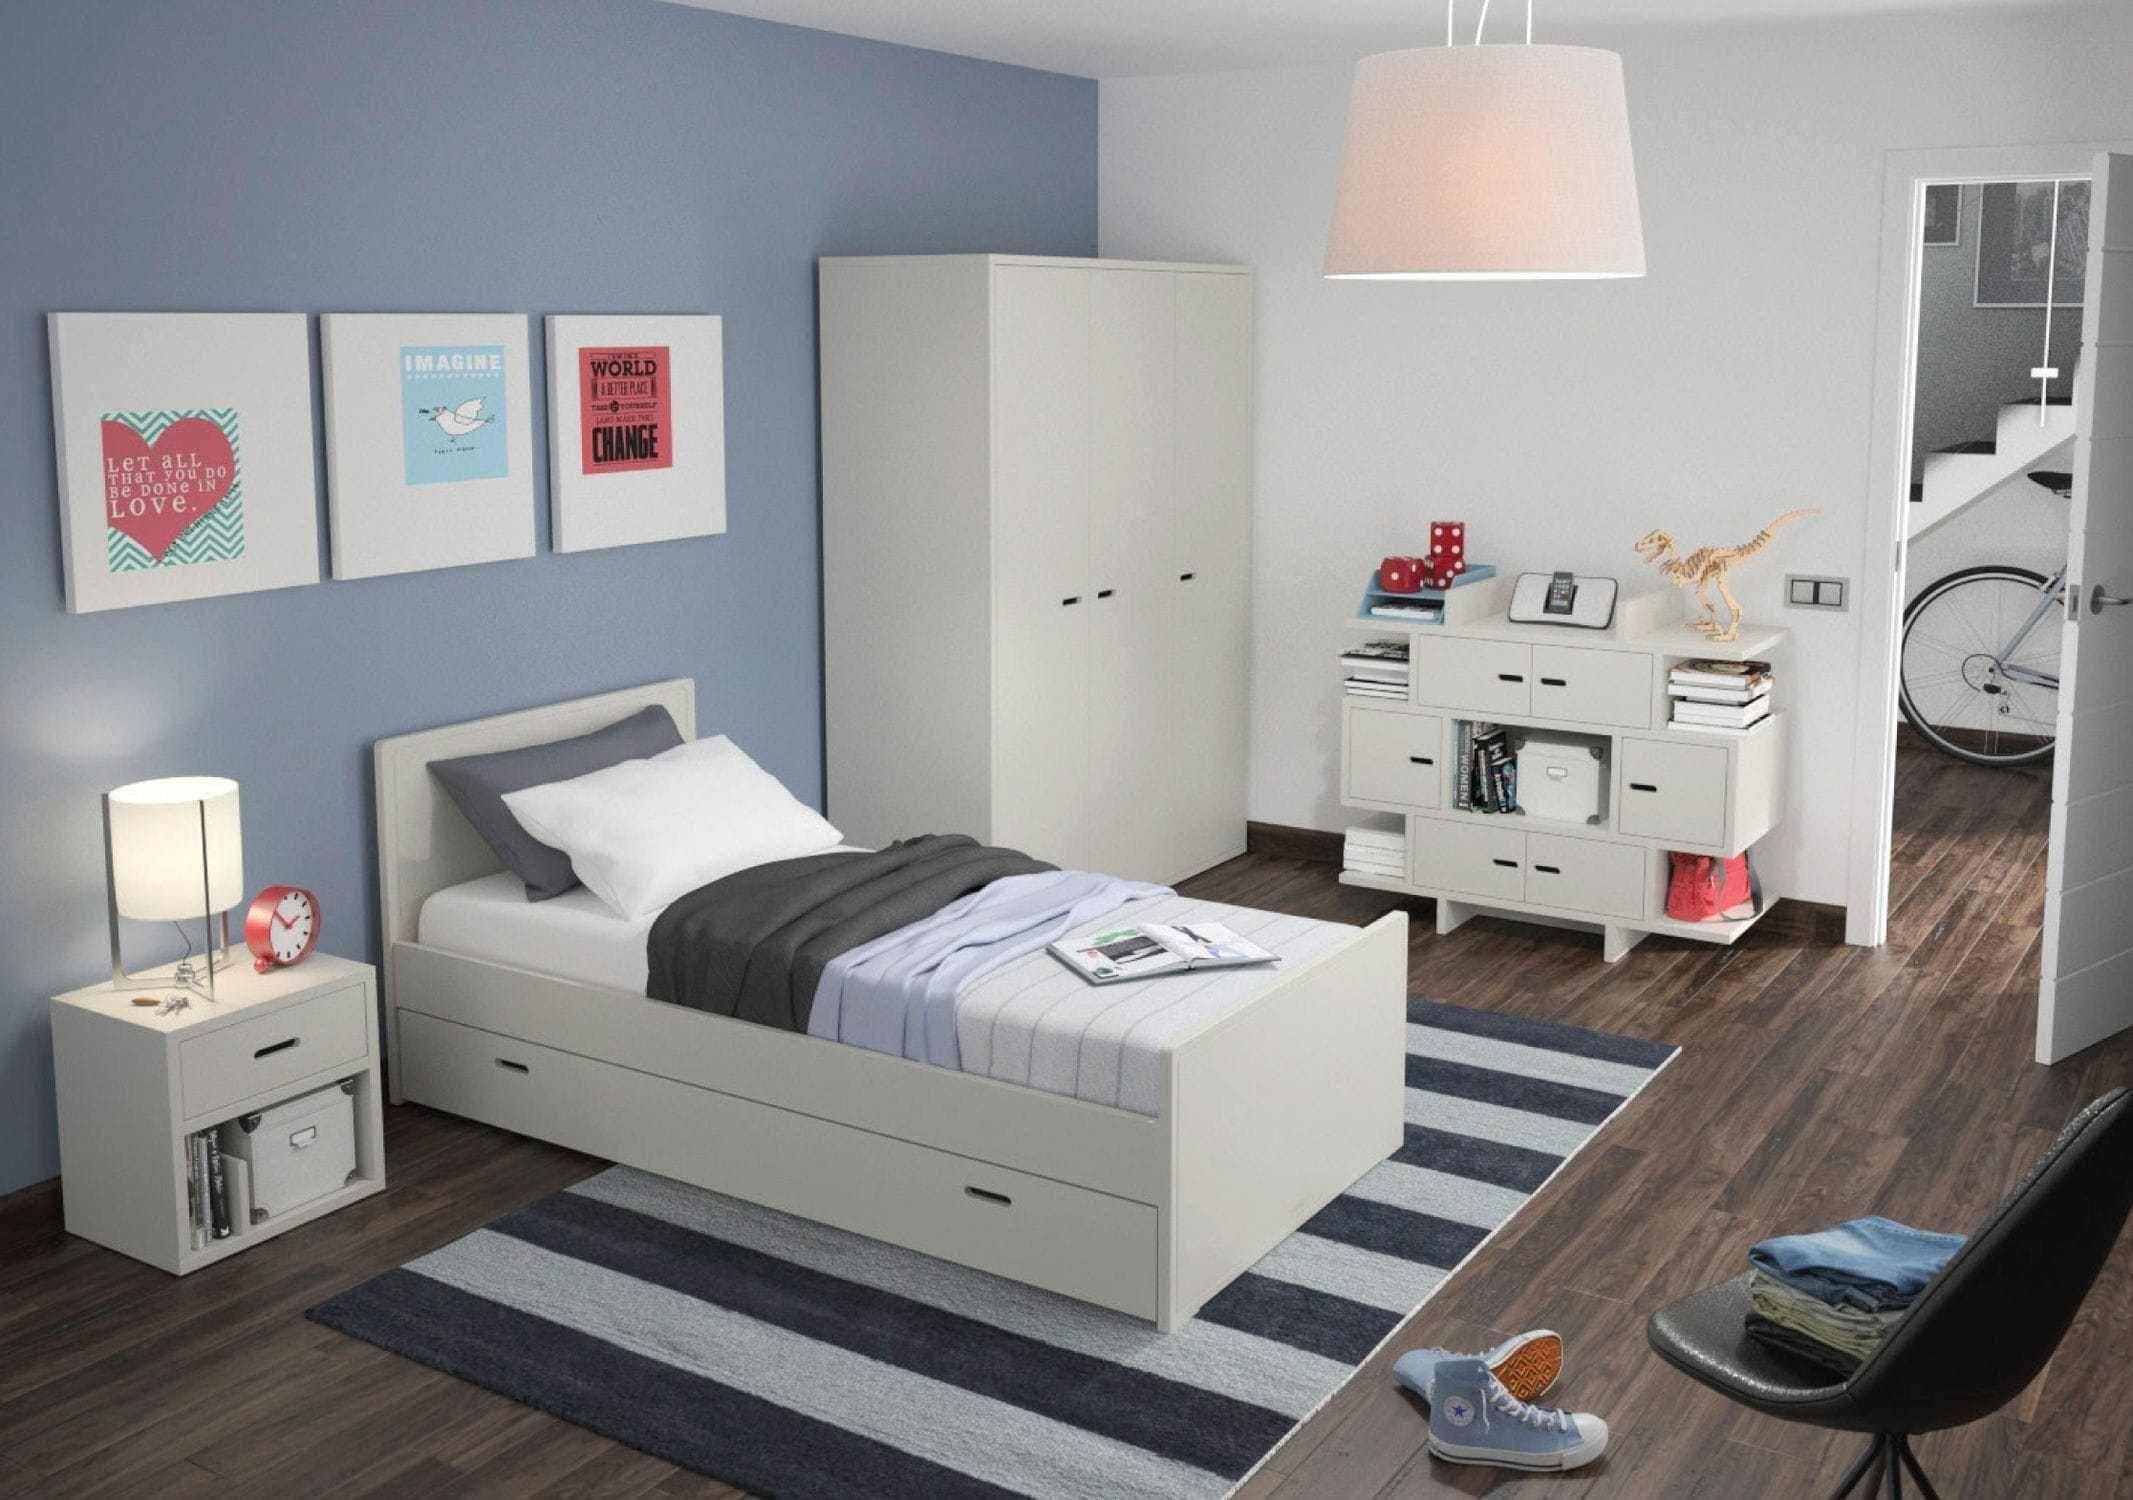 Bedroom Set for Girls Fresh 15 Lovely Childrens Bedroom Furniture Sets Ideas